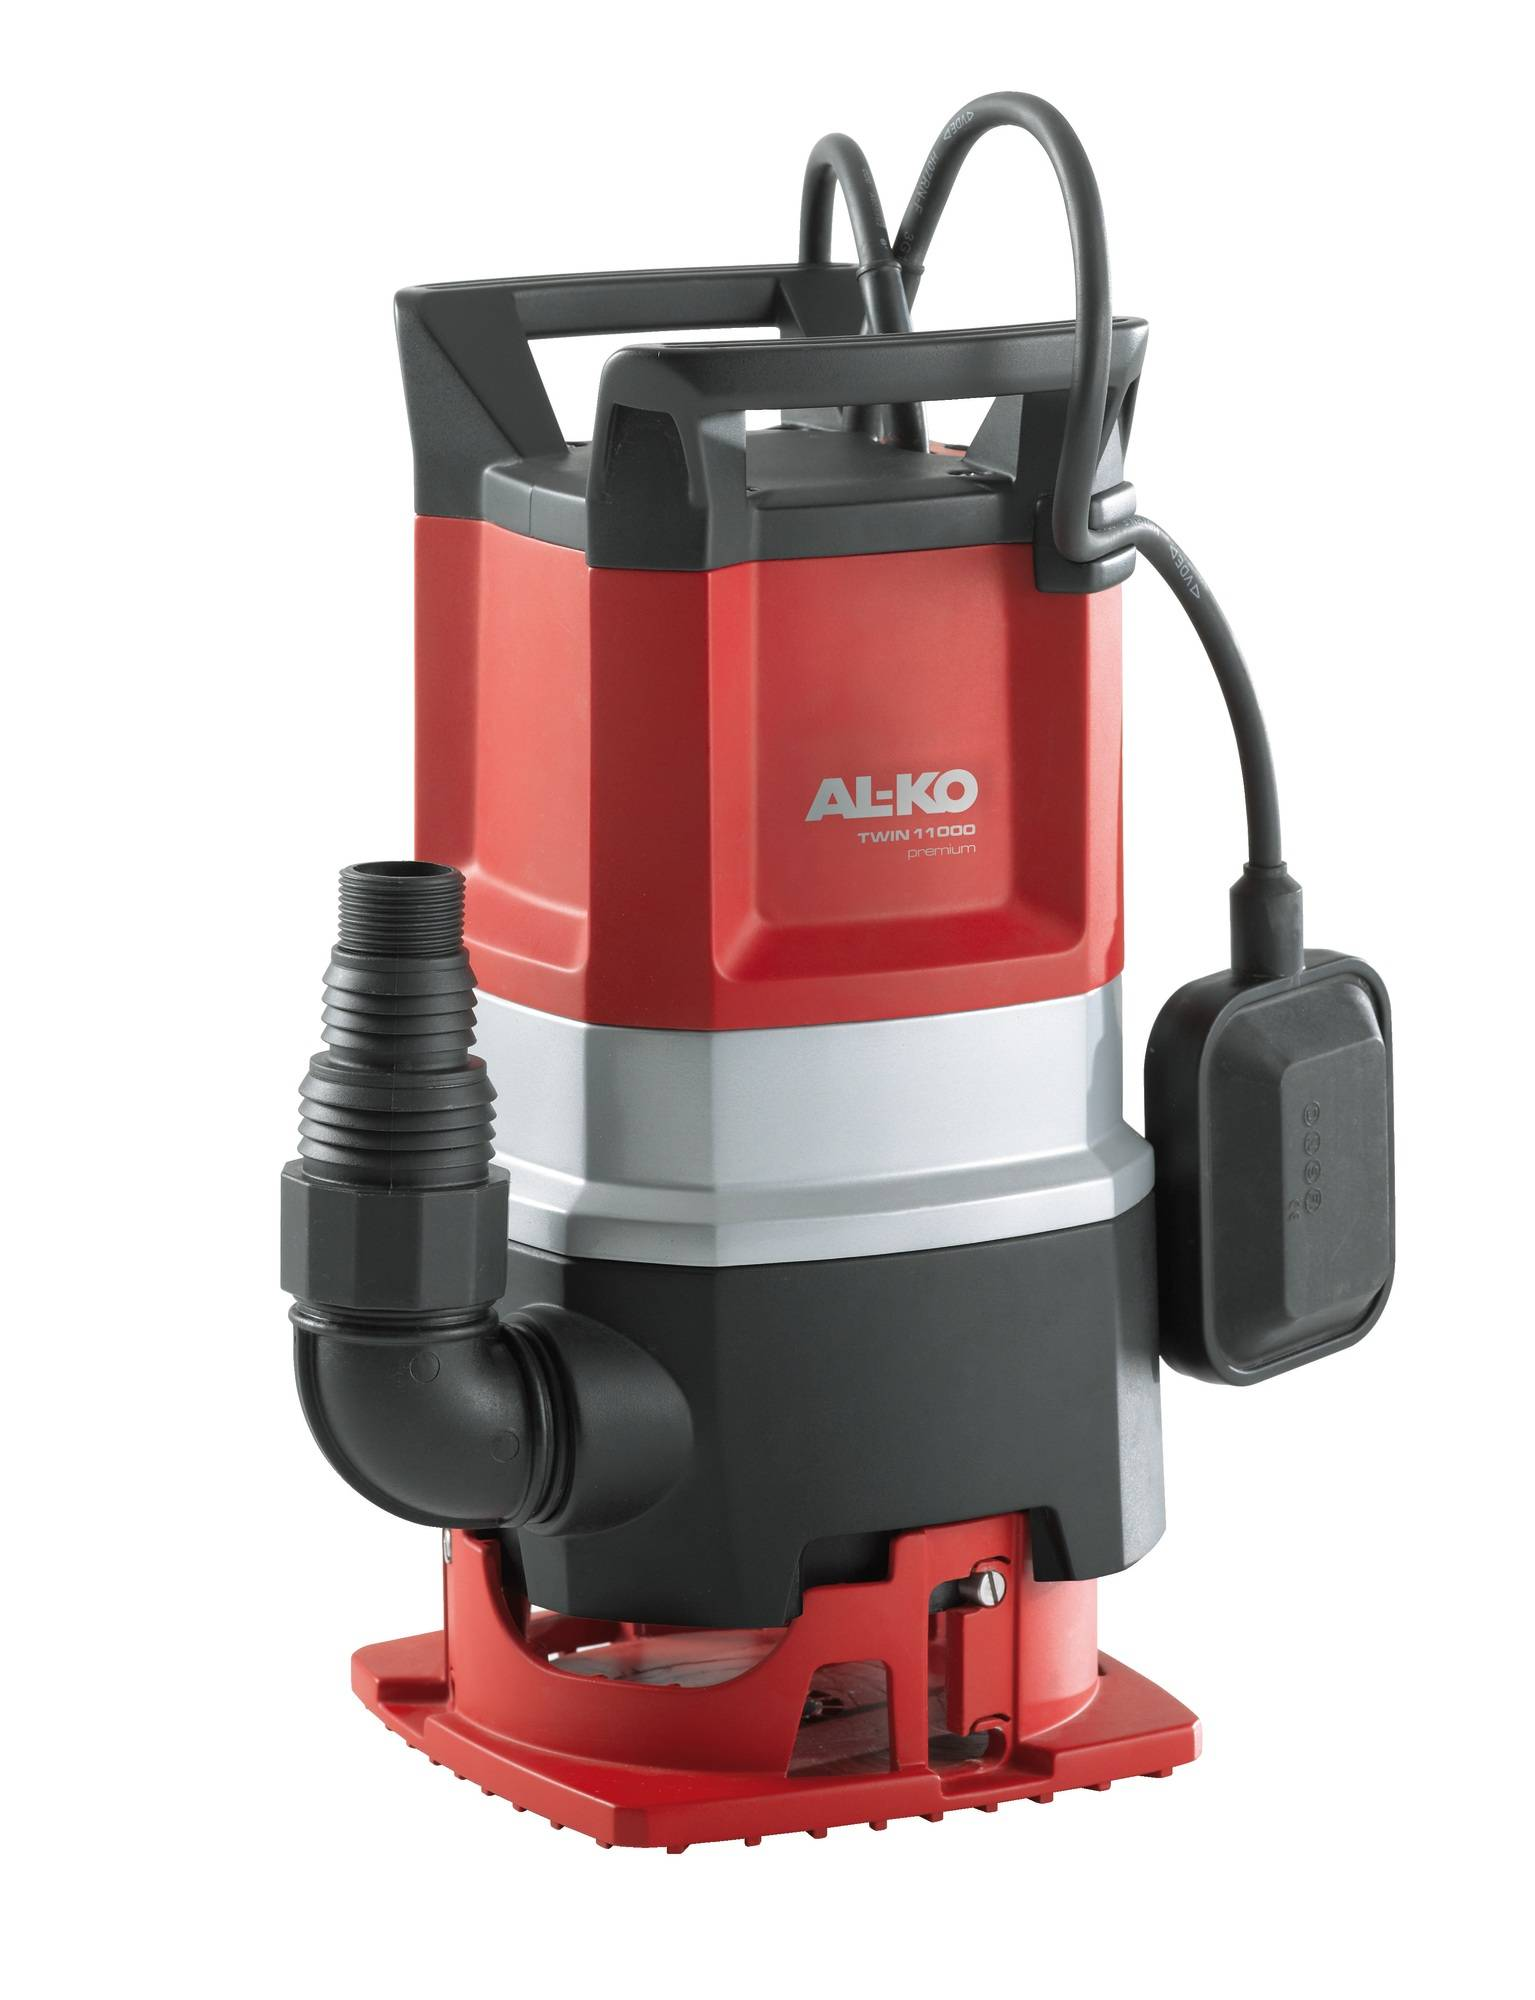 AL-KO Twin 11000 Premium 850W uppopumppu